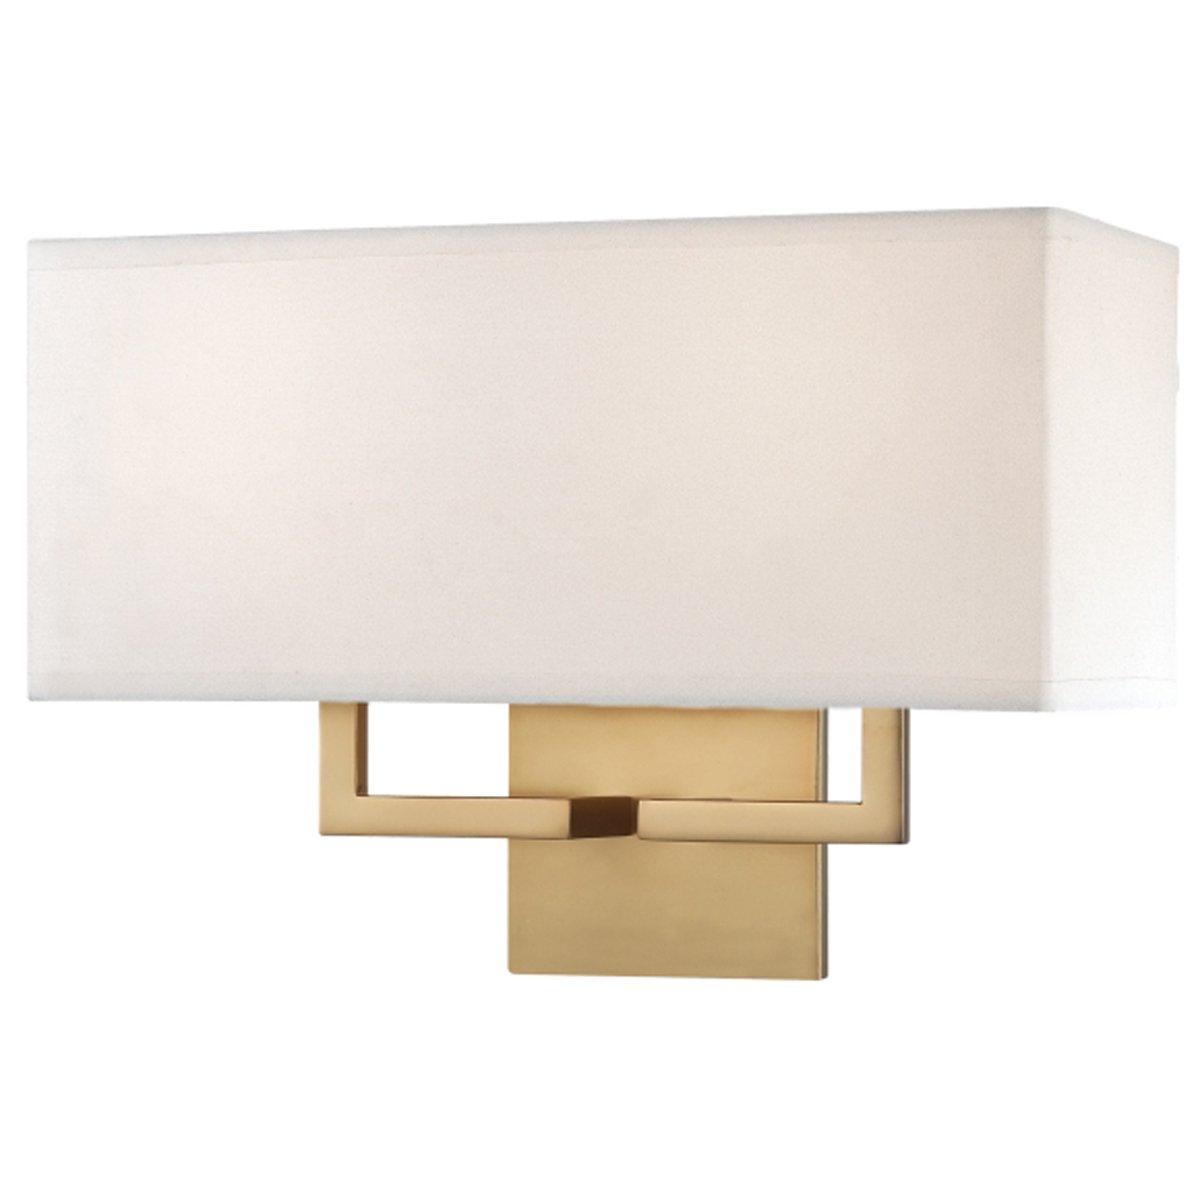 George Kovacs P472-248, 2 Light Wall Sconce, Honey Gold by Kovacs